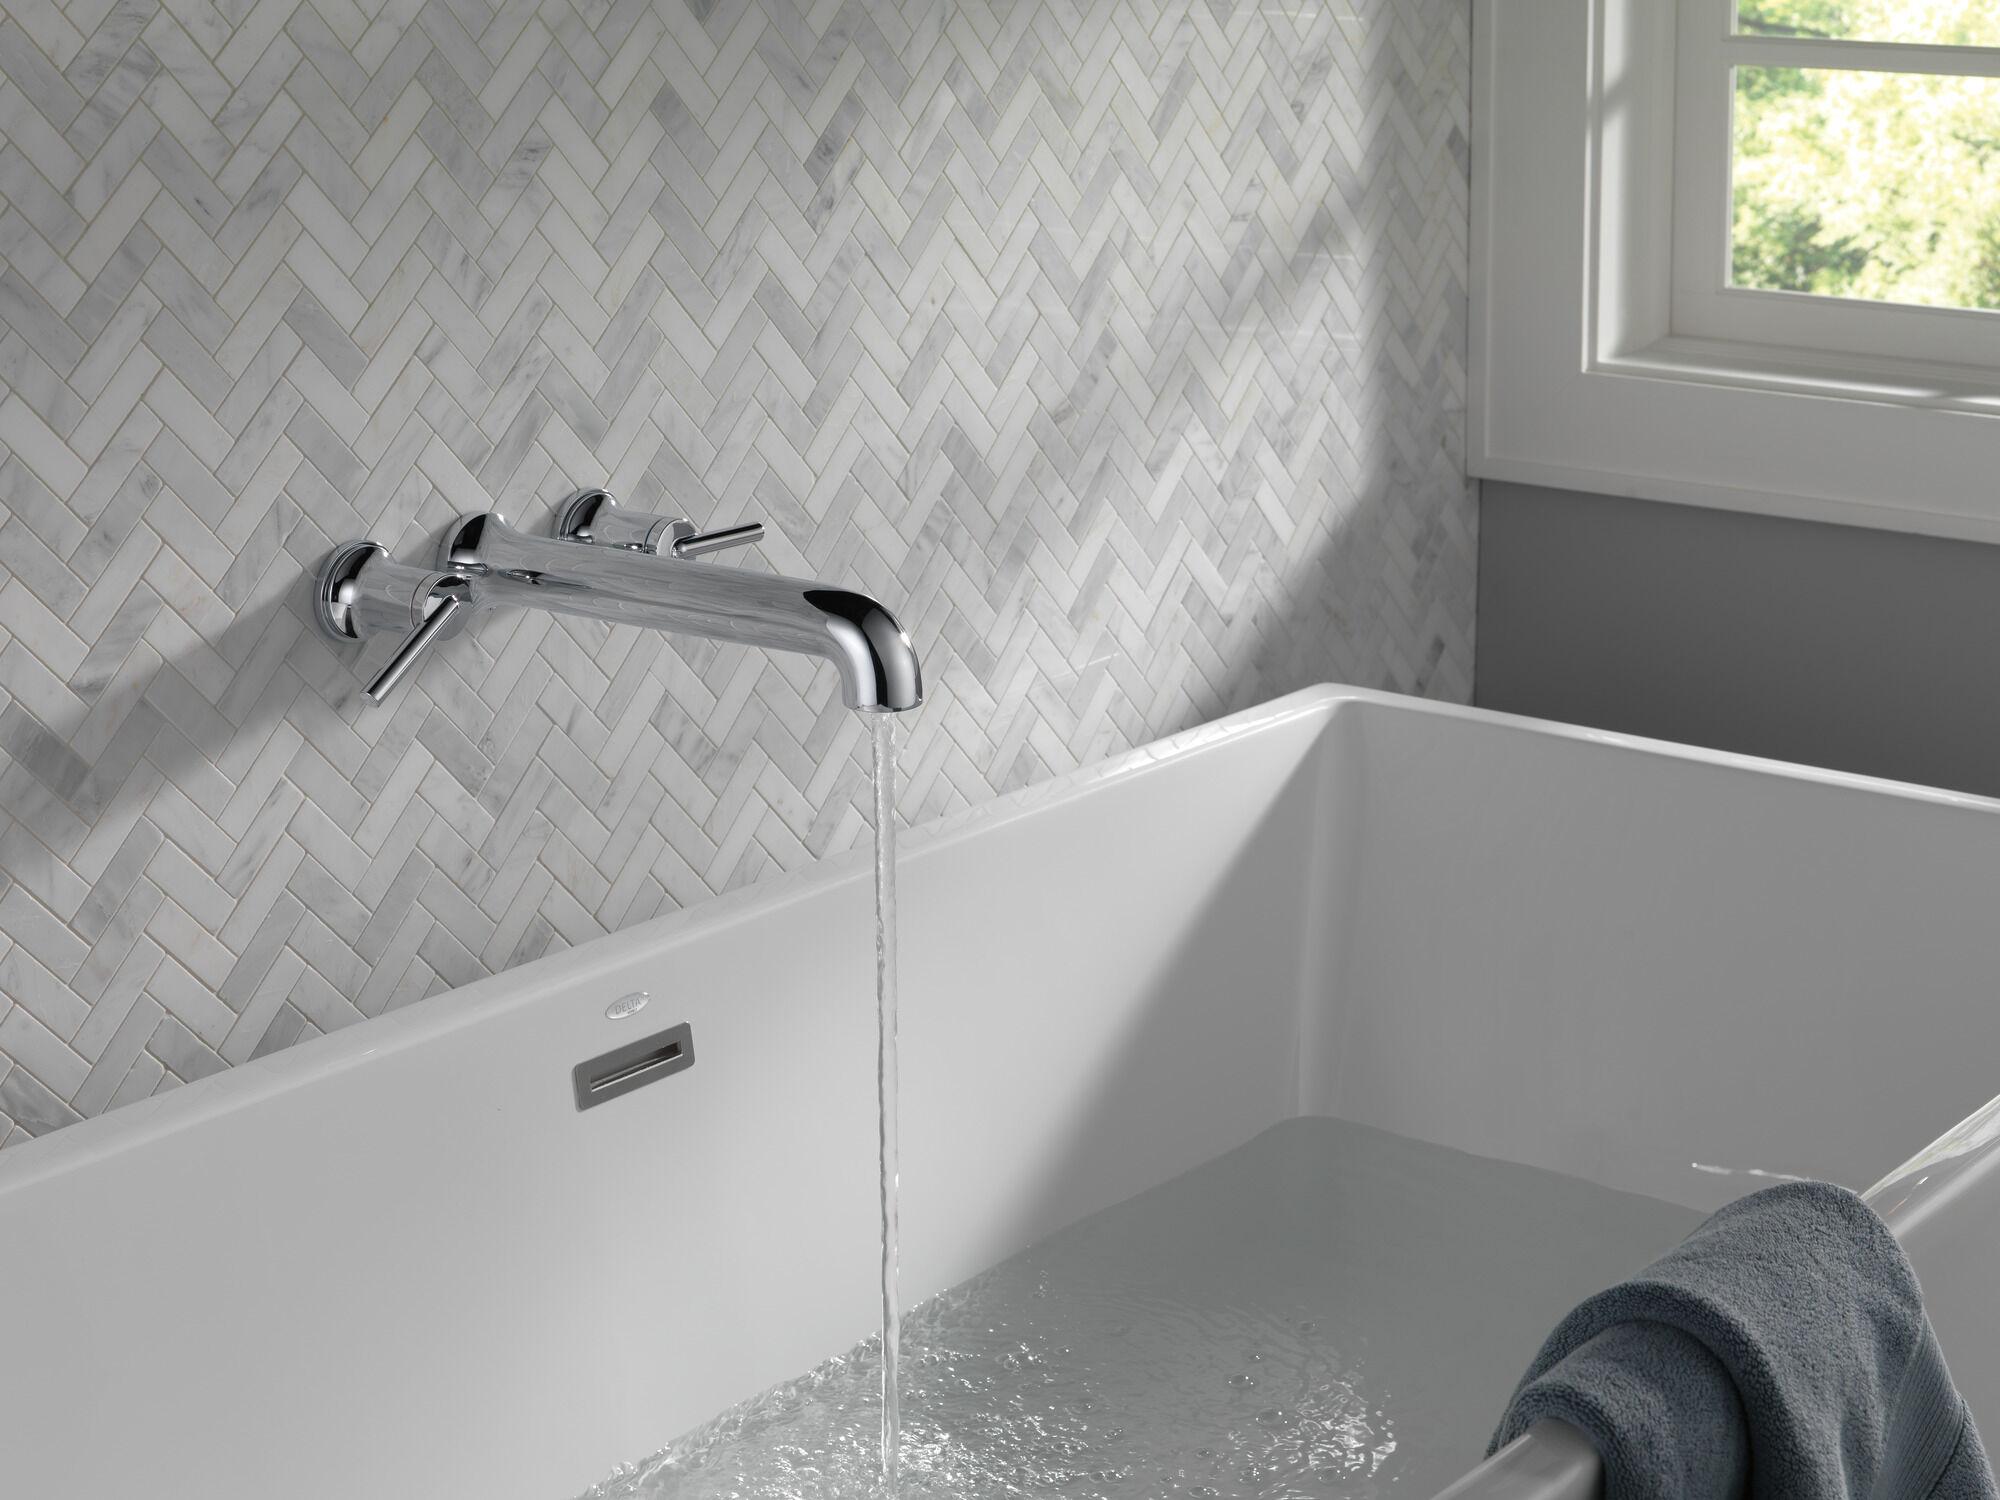 wall mounted tub filler